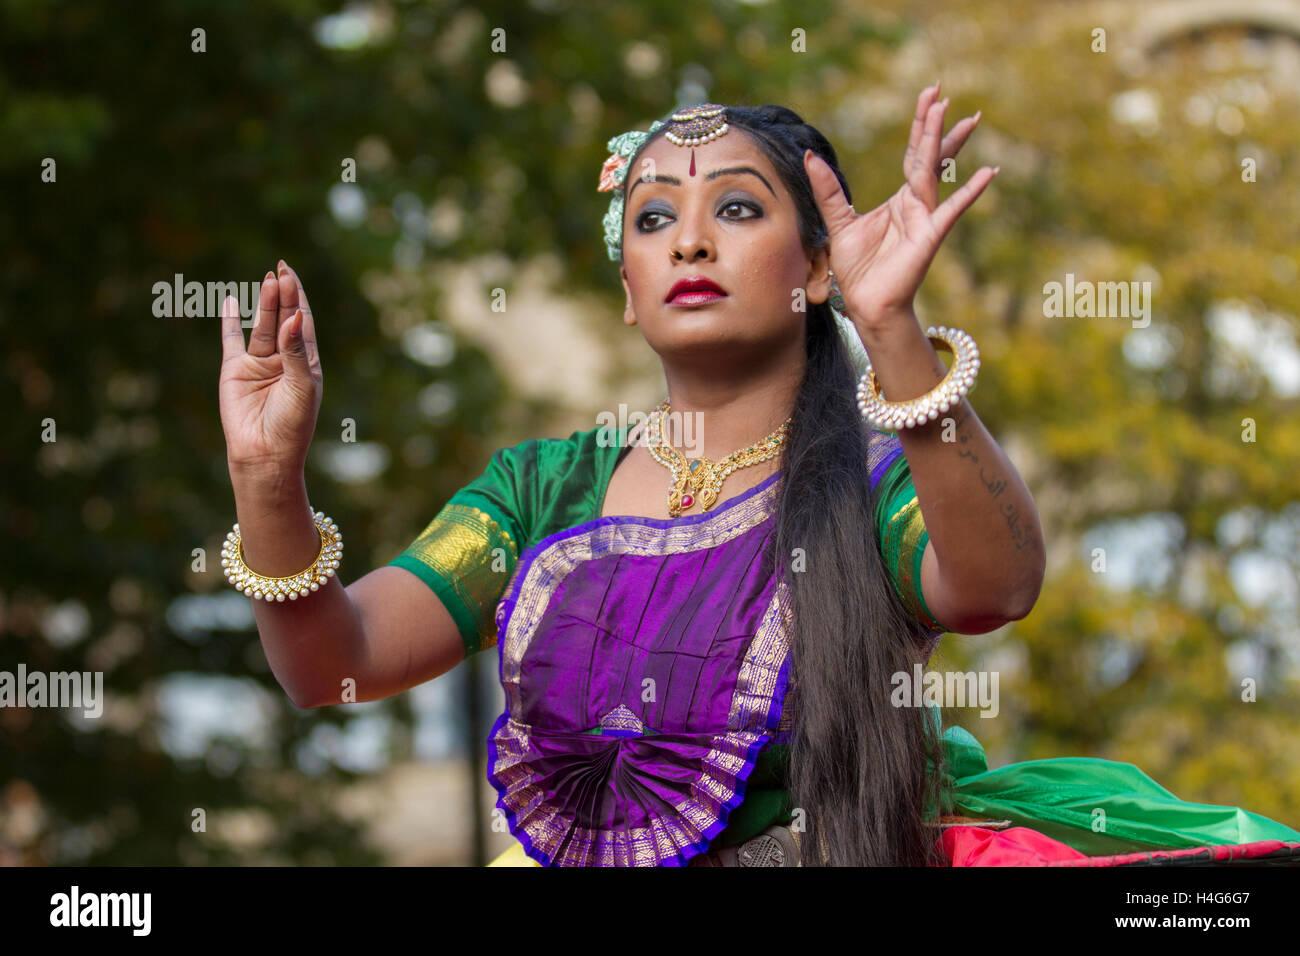 Manchester, UK.   15th October, 2016. Bheega Bheega as Sita at the 11th annual Dashehra Diwali Mela held in Albert - Stock Image